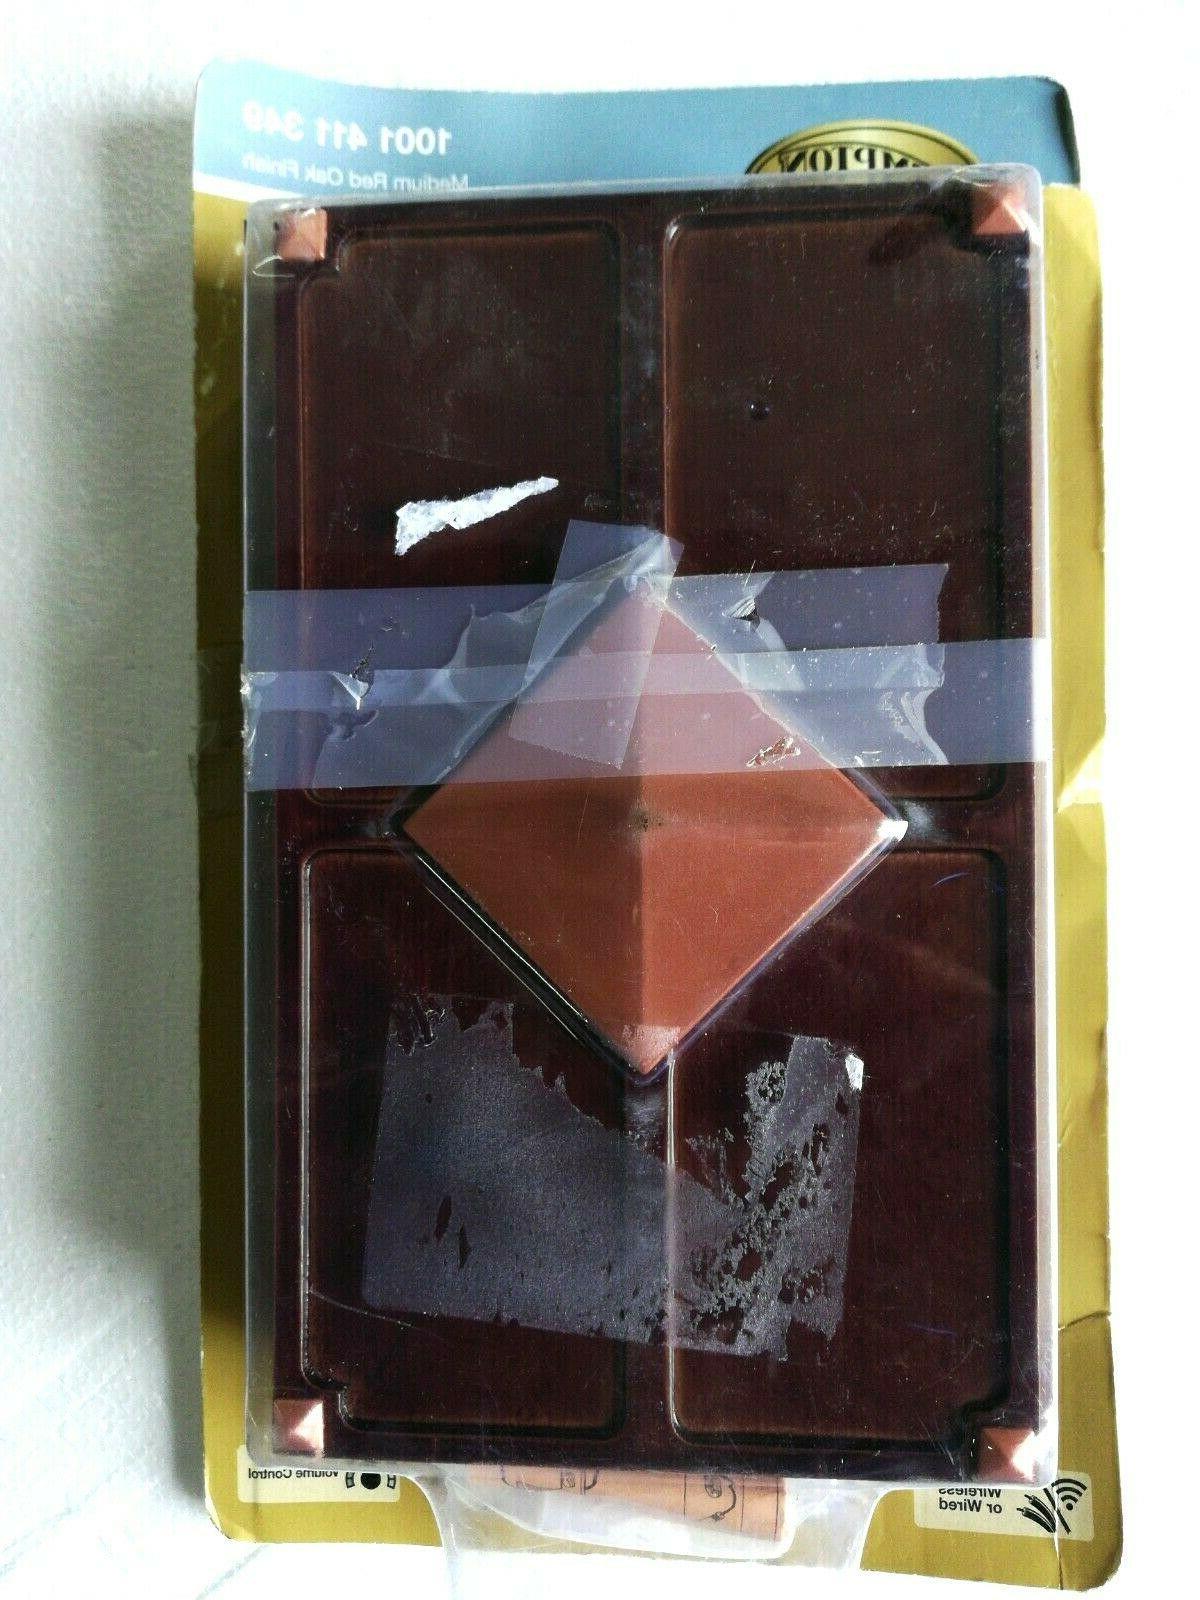 wireless wired doorbell medium red oak finish